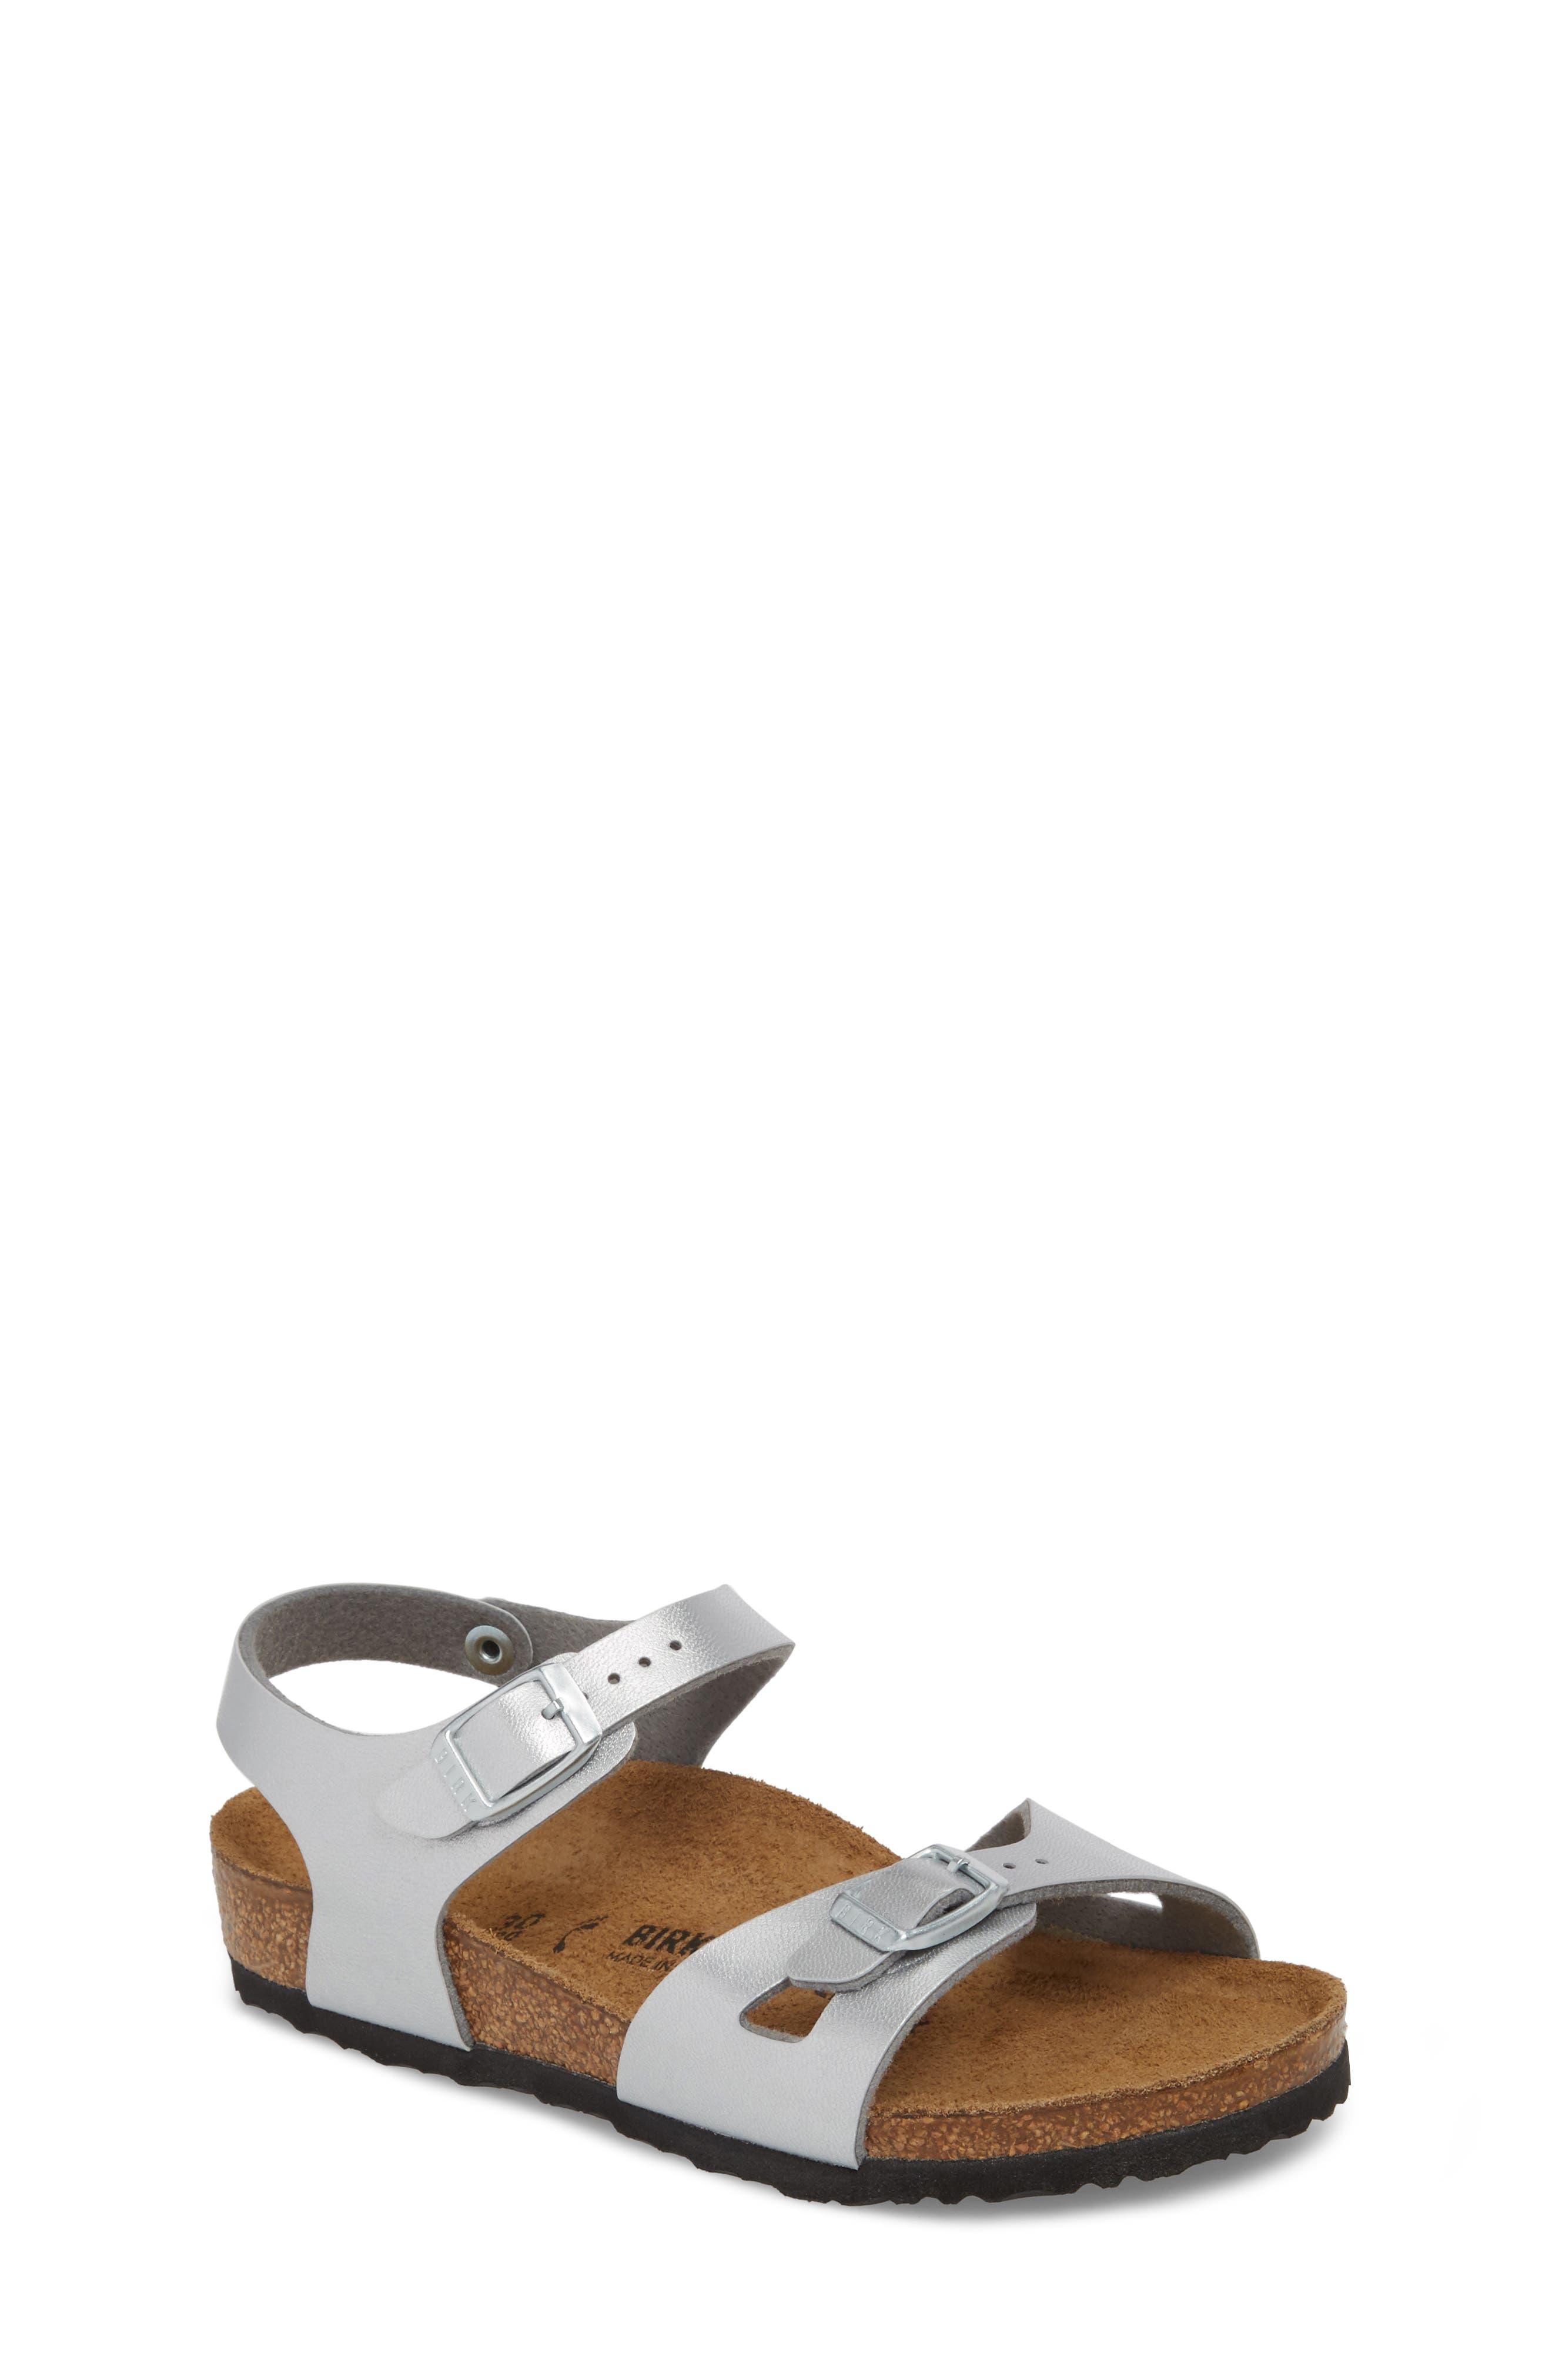 BIRKENSTOCK Rio Metallic Sandal, Main, color, SILVER